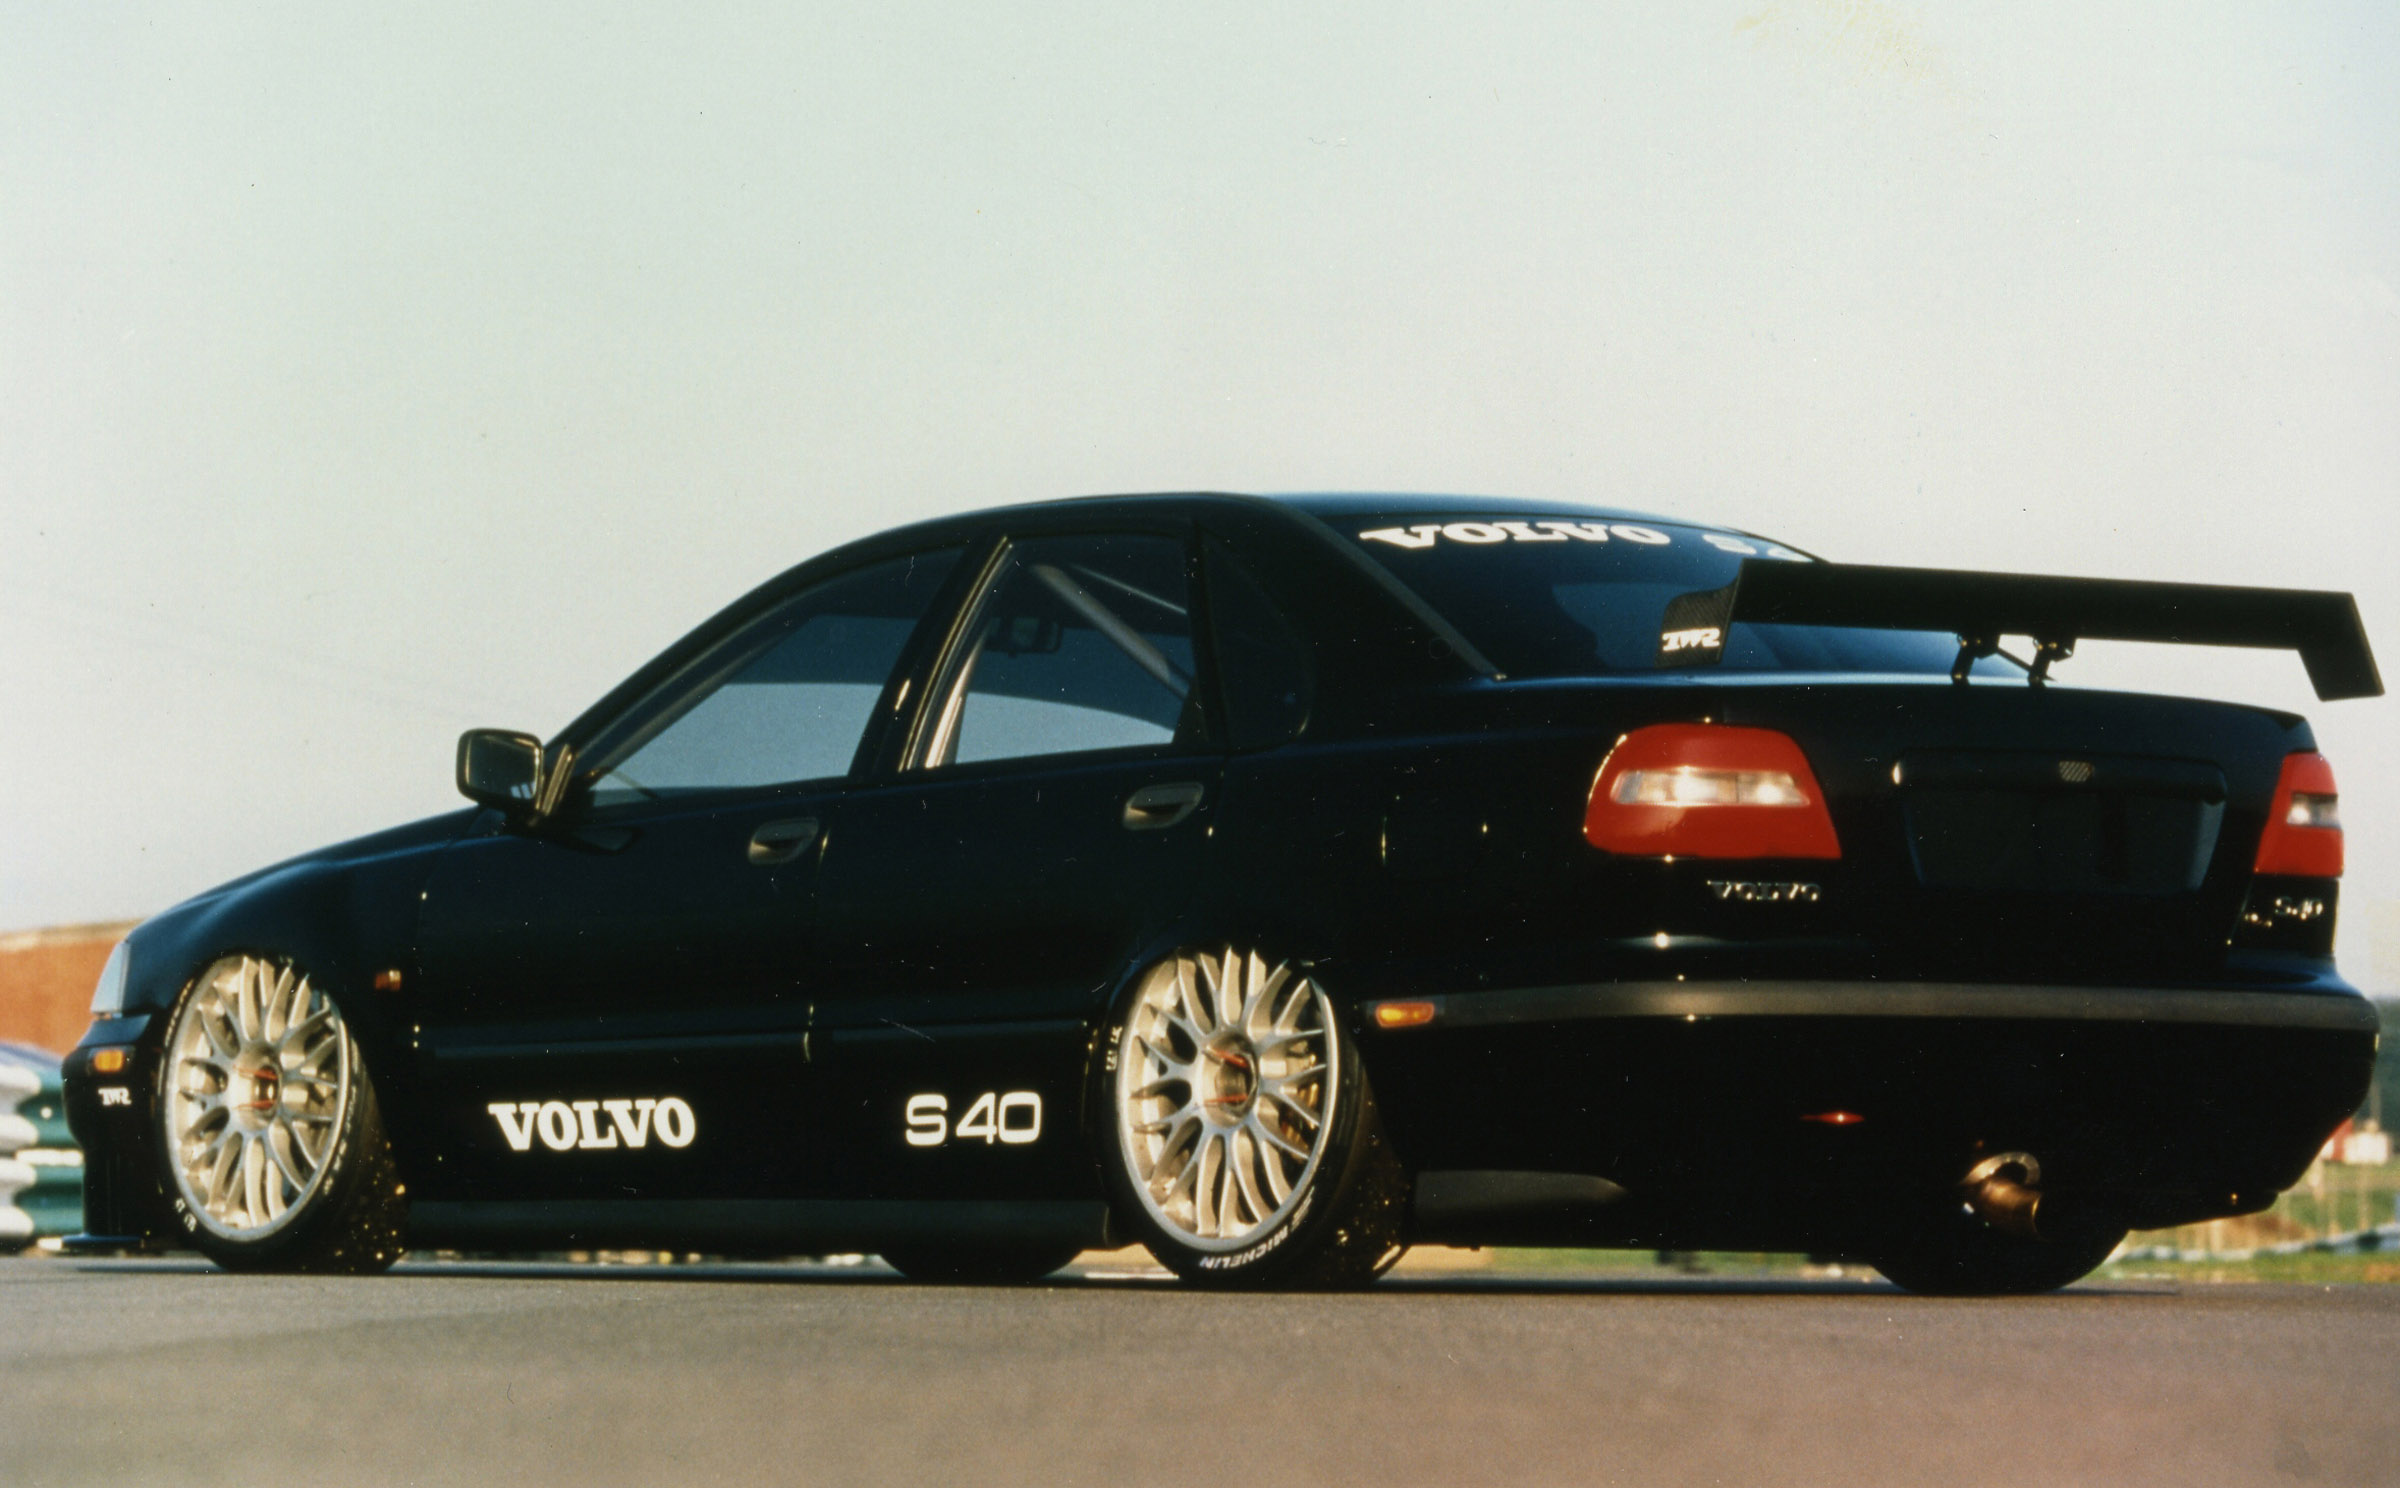 Volvo s40 tuning